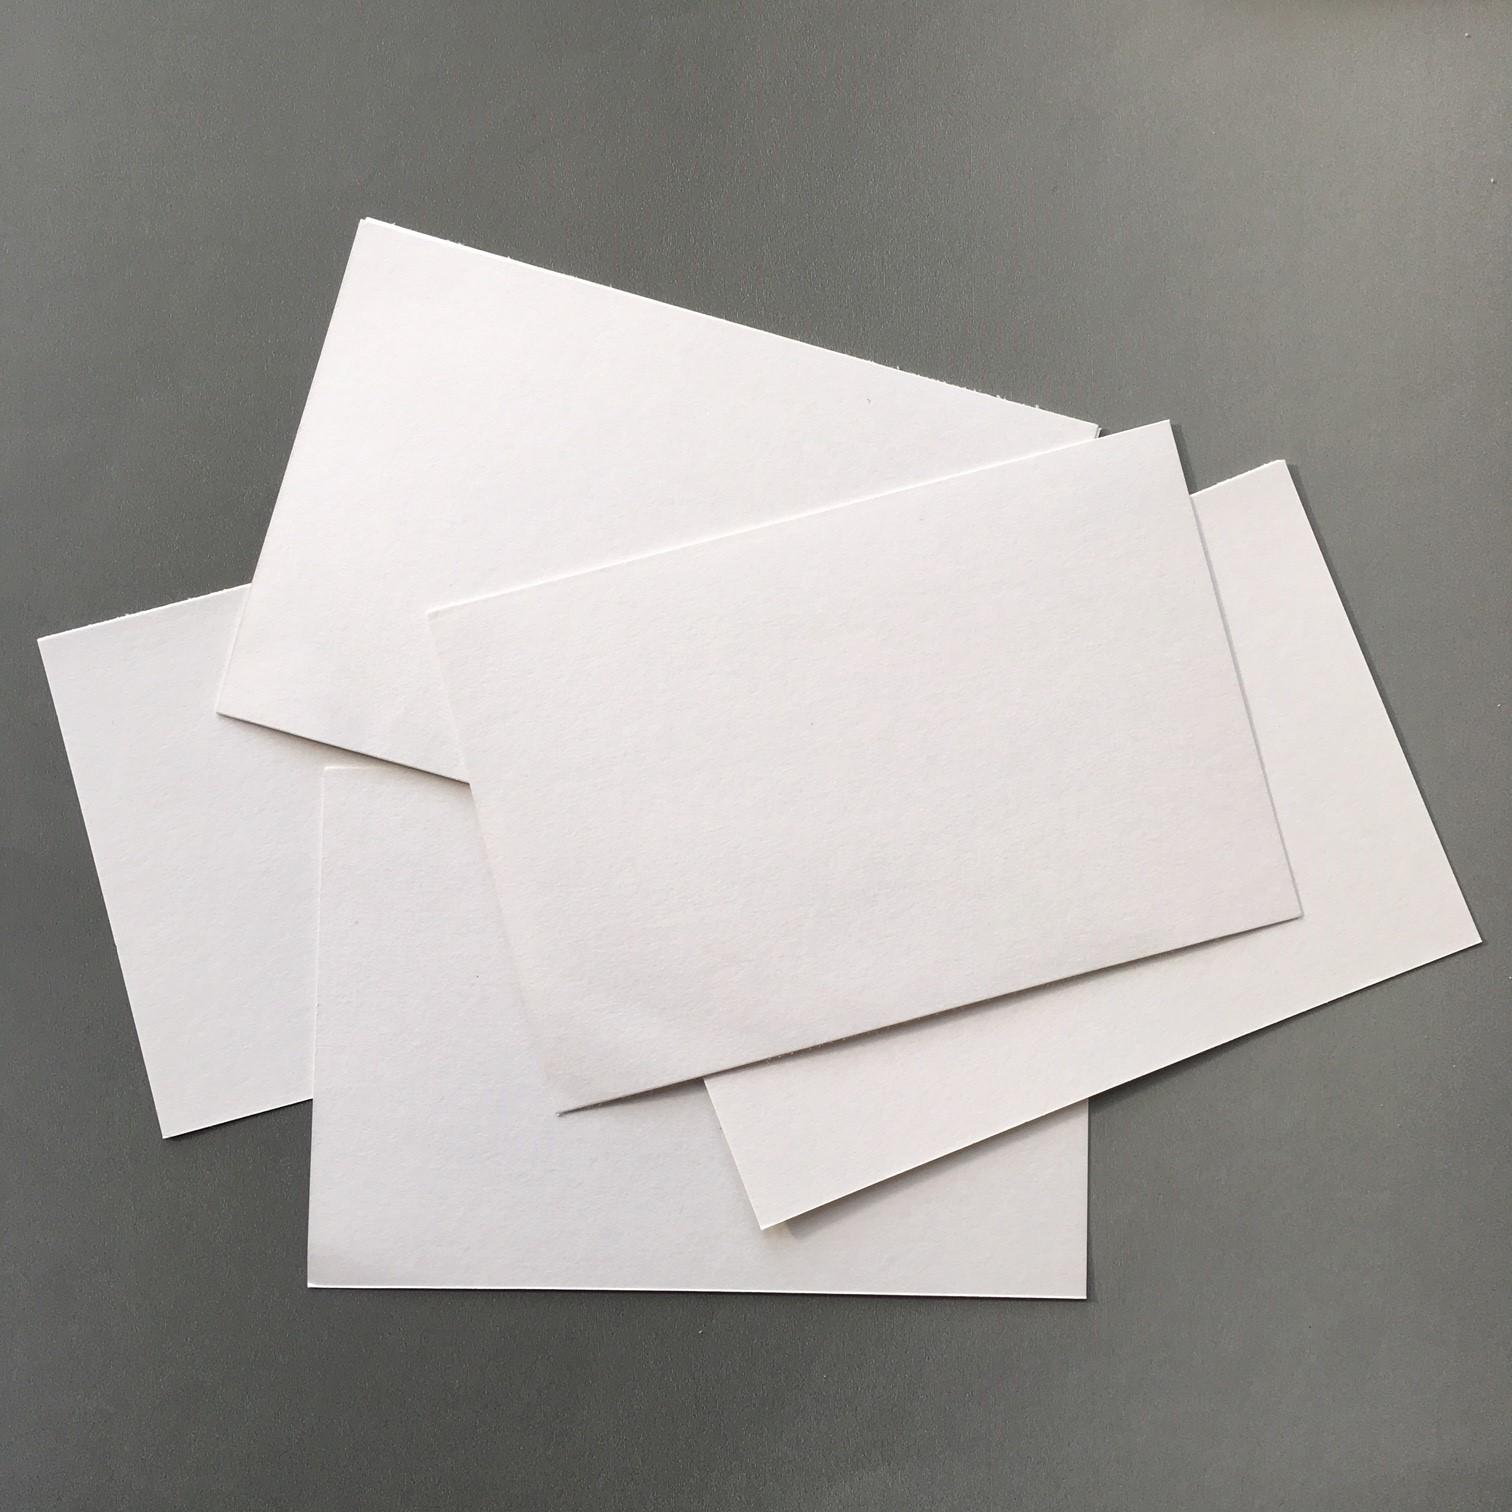 white soft cardboard for making the accordion-like shape